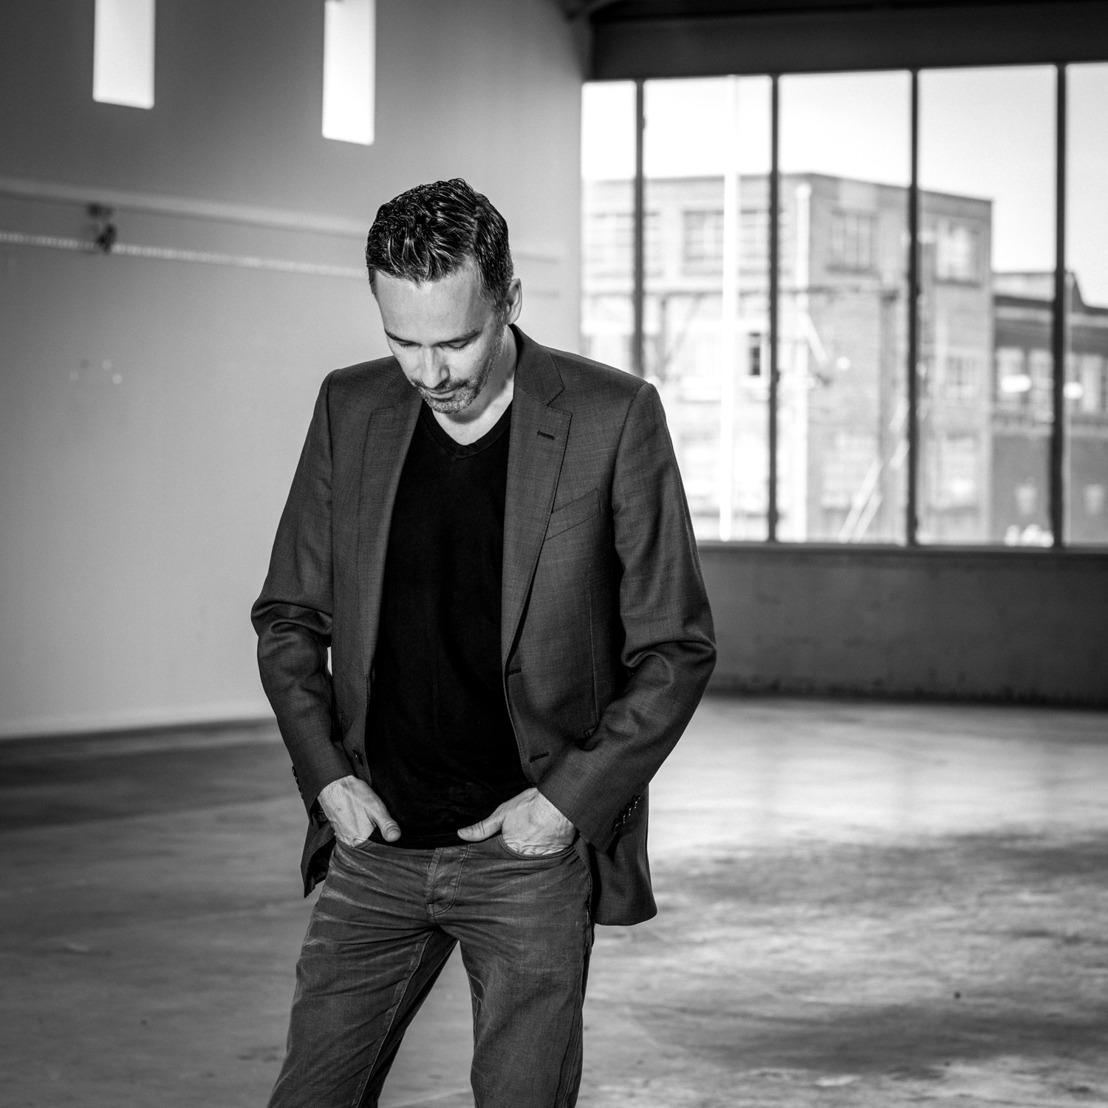 Joeri Van Den Broeck dans le prestigieux jury anglais des D&AD awards